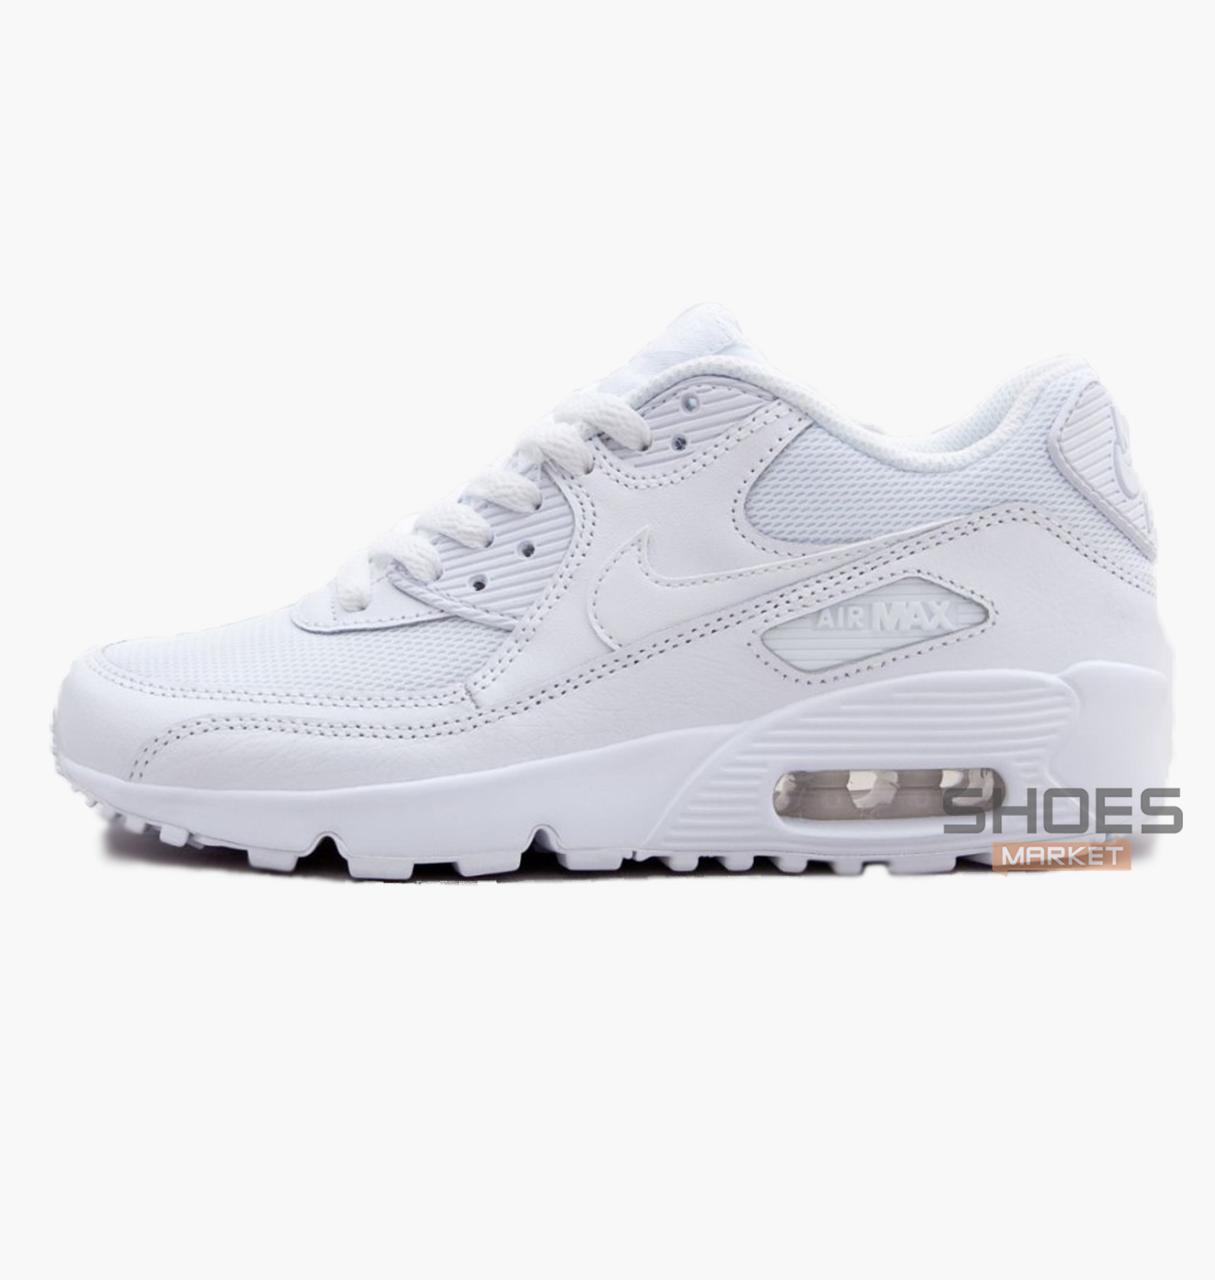 Женские кроссовки Nike Air Max 90 Mesh (GS) White 833418 100, оригинал